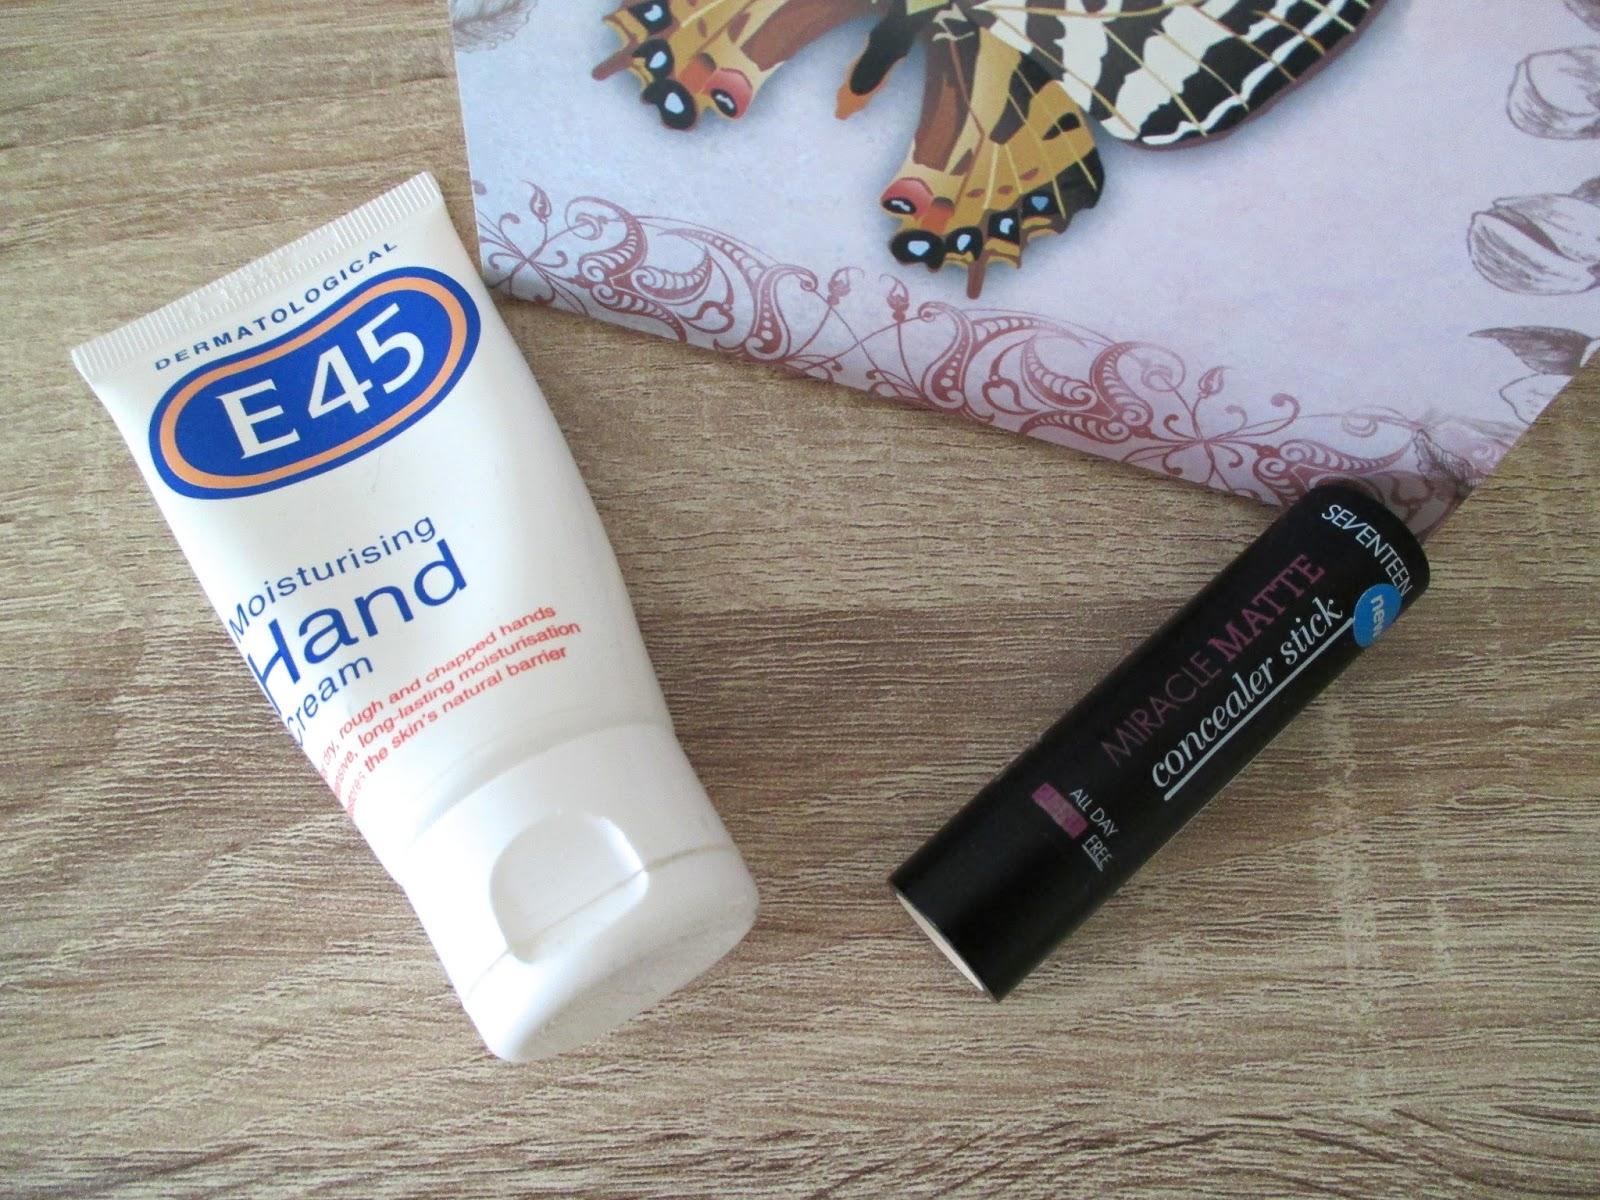 E45 hand cream and Seventeen concealer